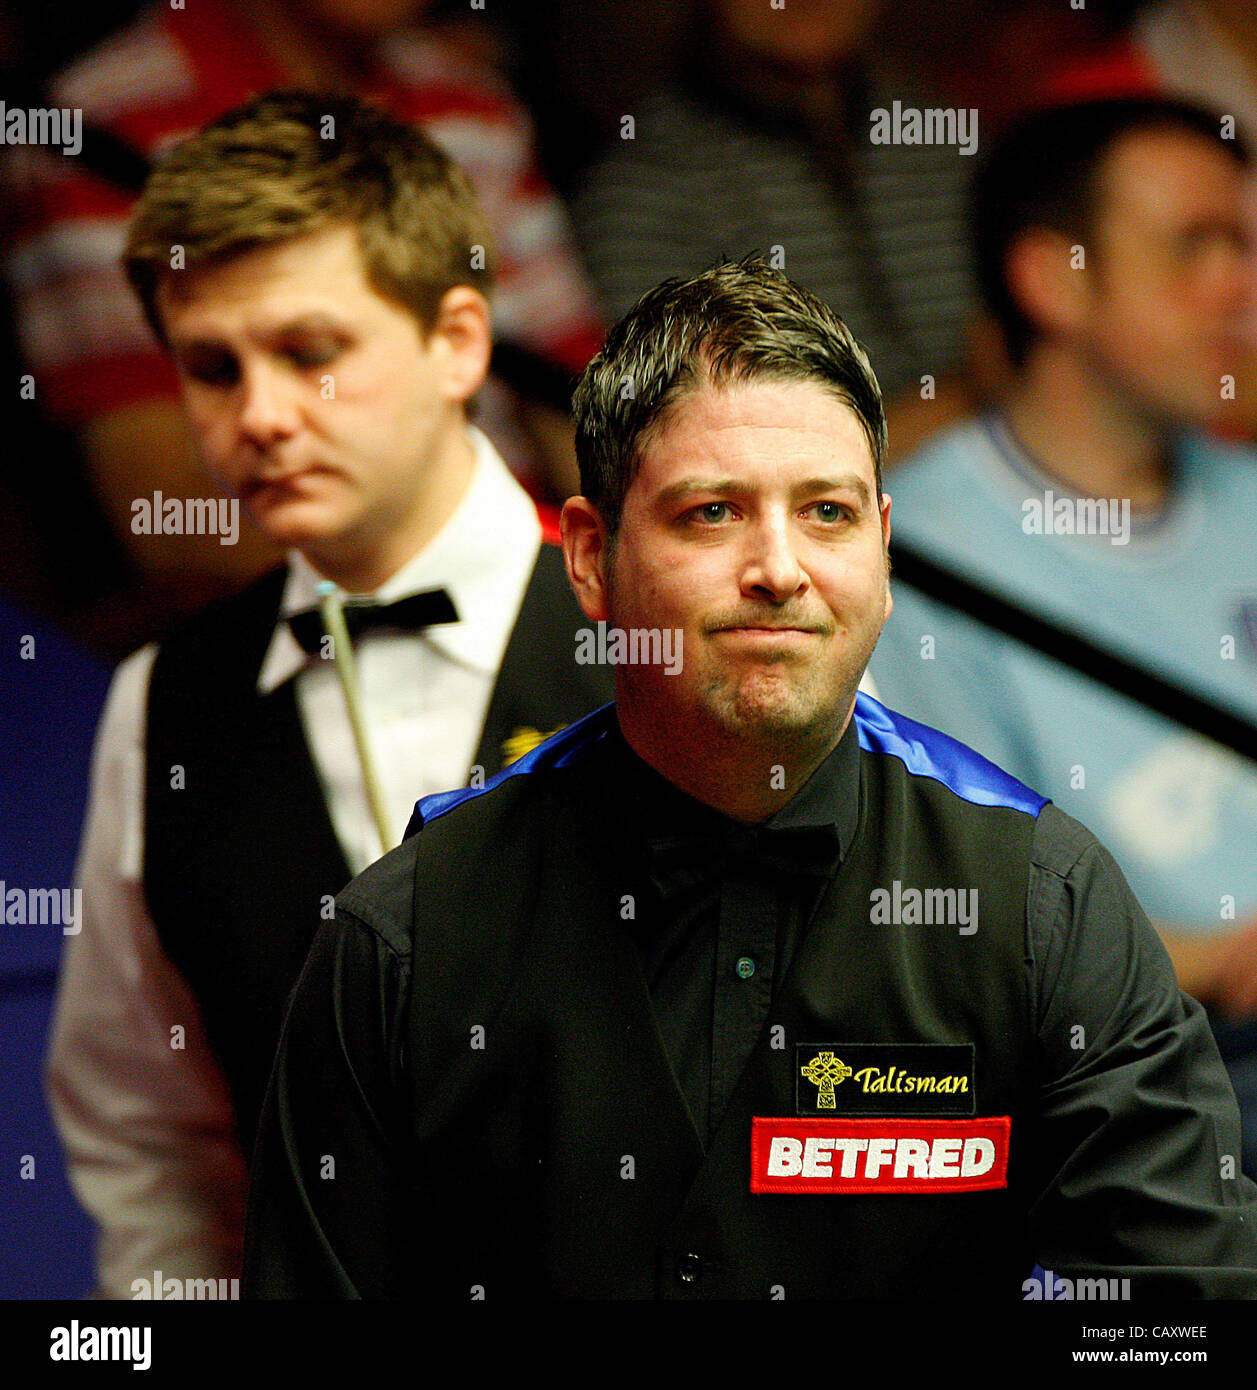 May 2, 2012 - Sheffield, England - 02.05.2012 -  Ryan Day lost 13-5 over Matthew Stevens, World Snooker Championship - Stock Image